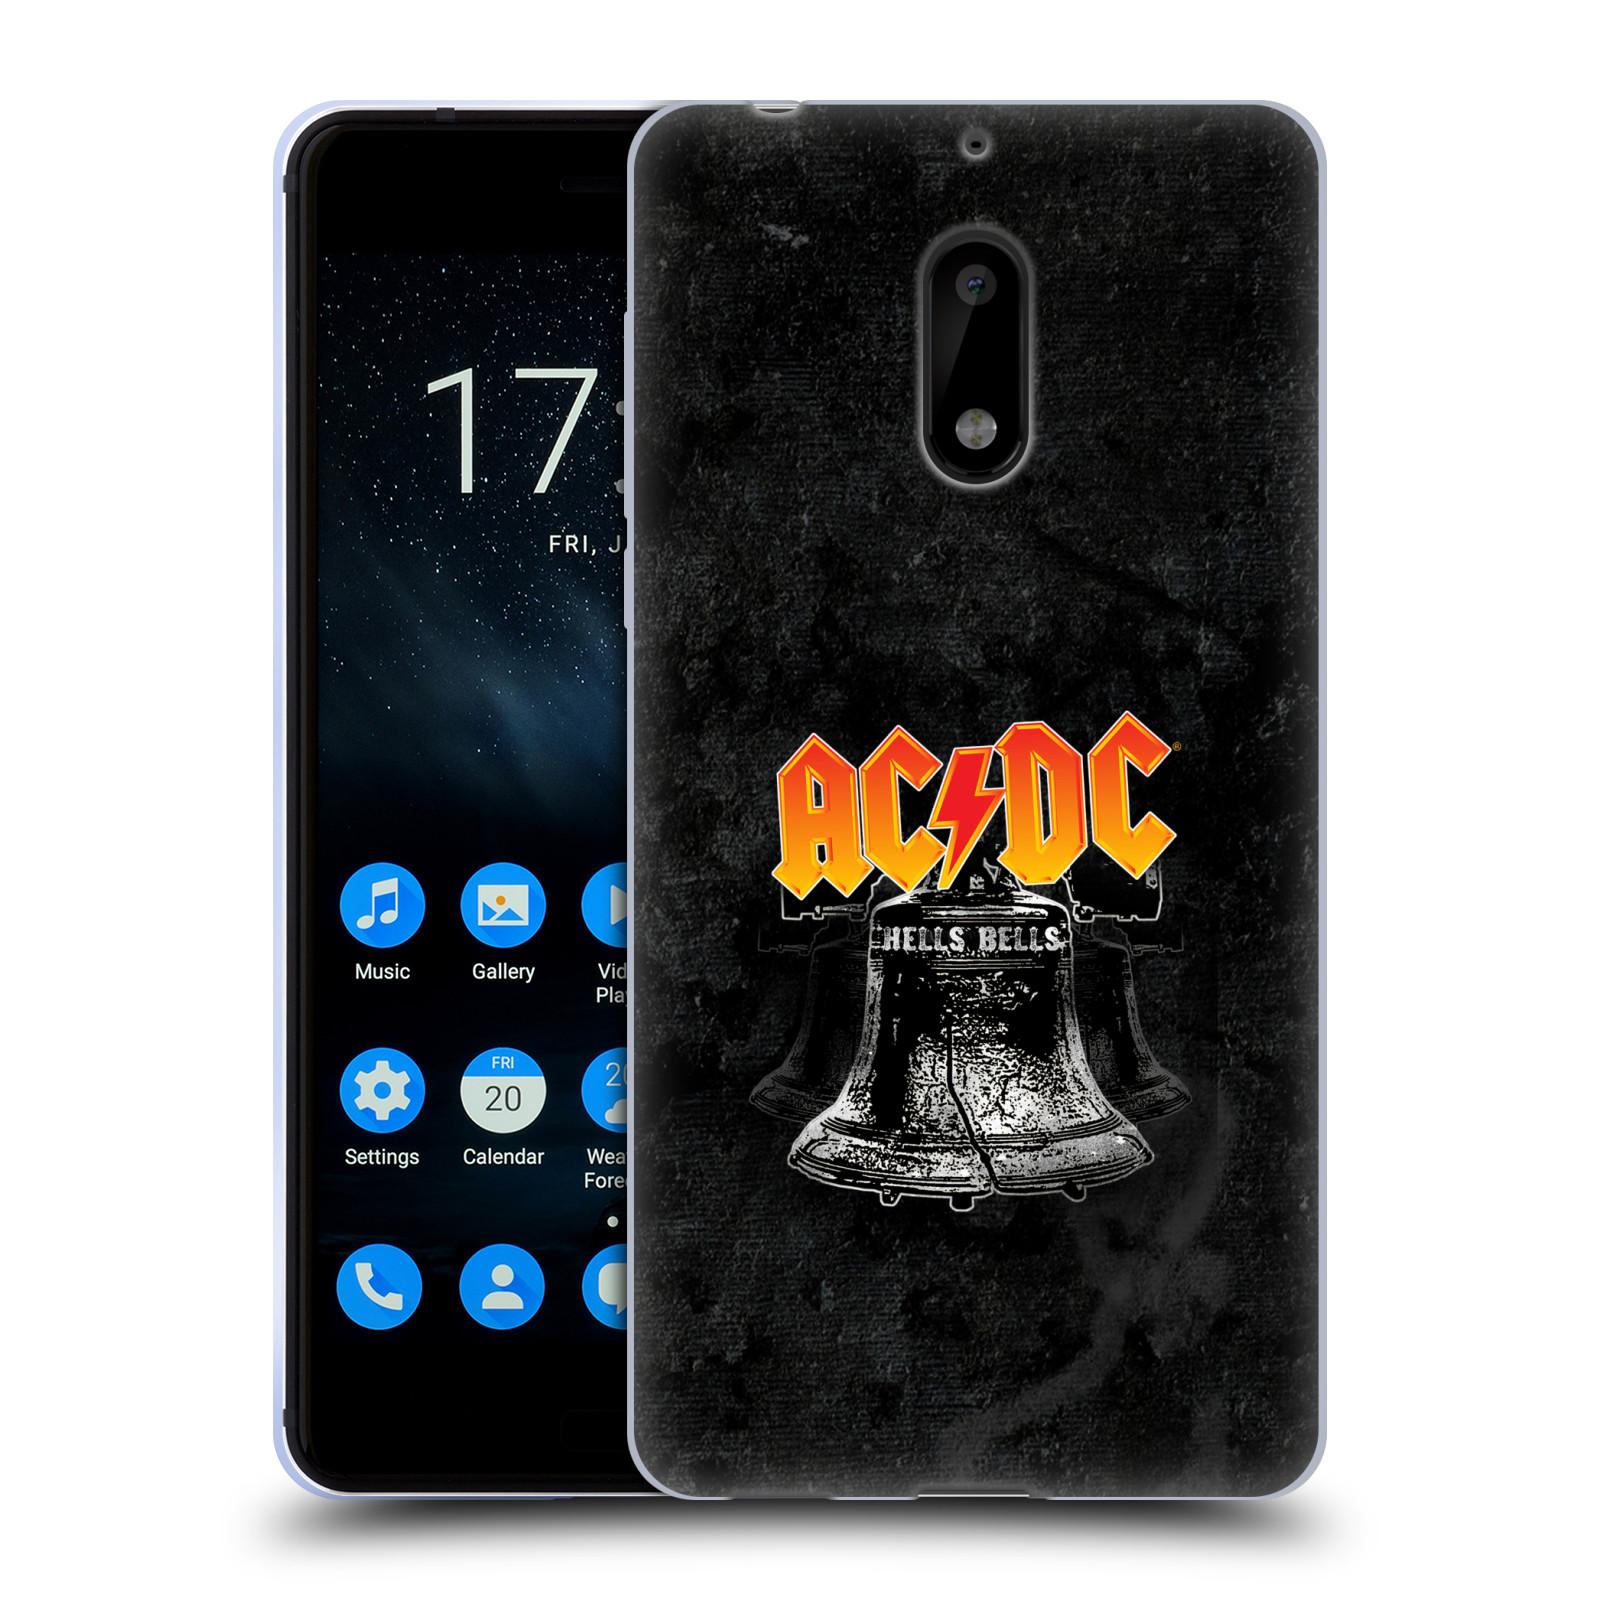 Silikonové pouzdro na mobil Nokia 6 - Head Case - AC/DC Hells Bells